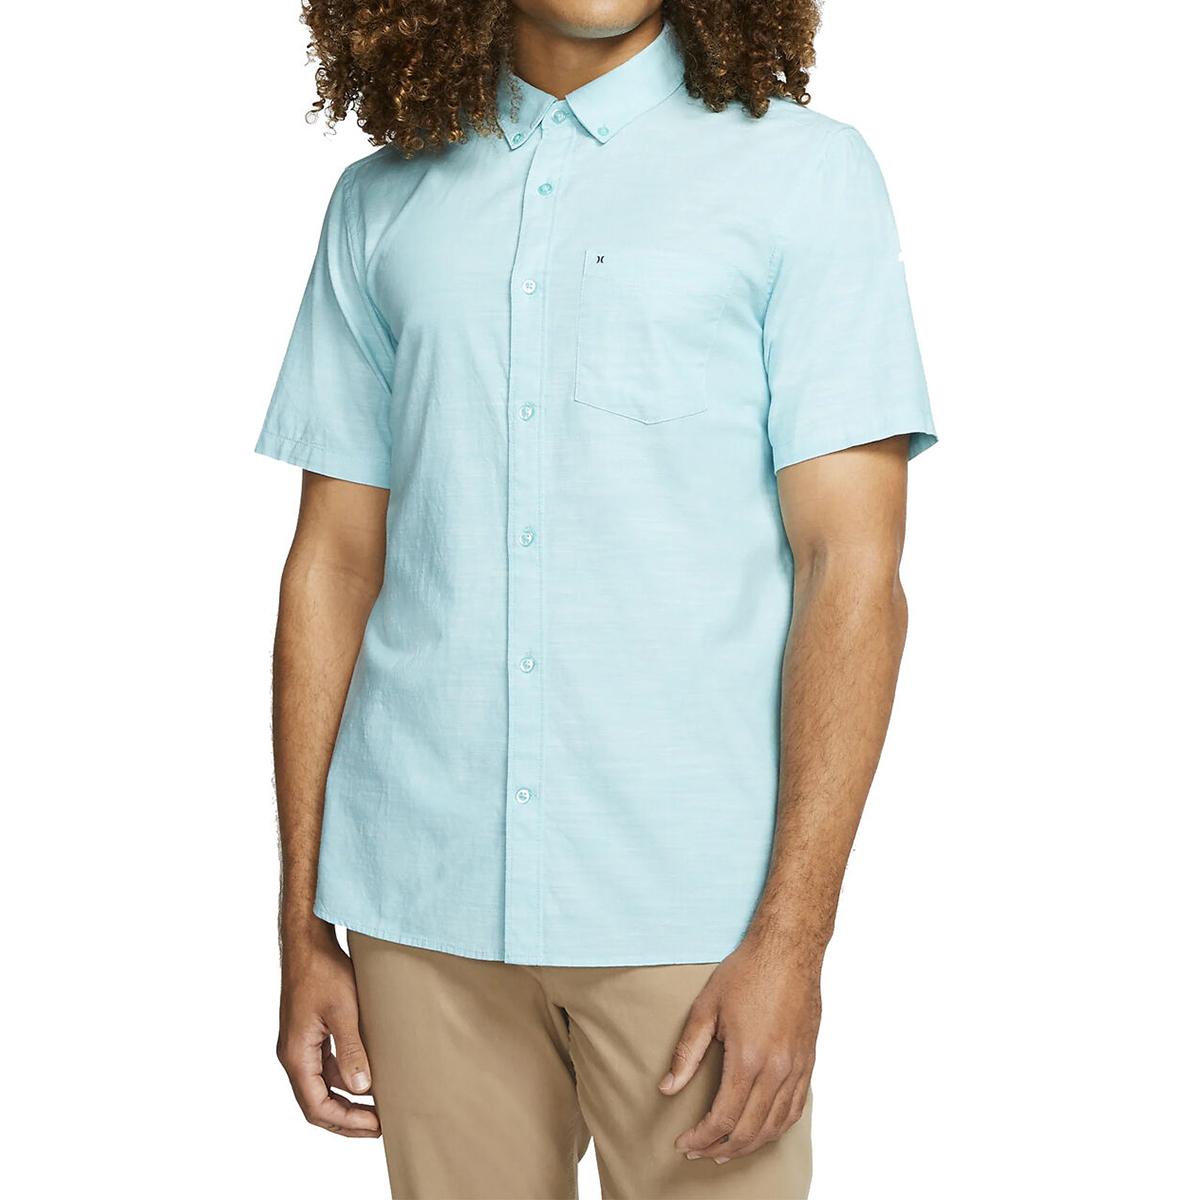 Hurley Men's One & Only Short-Sleeve Shirt - Green, M